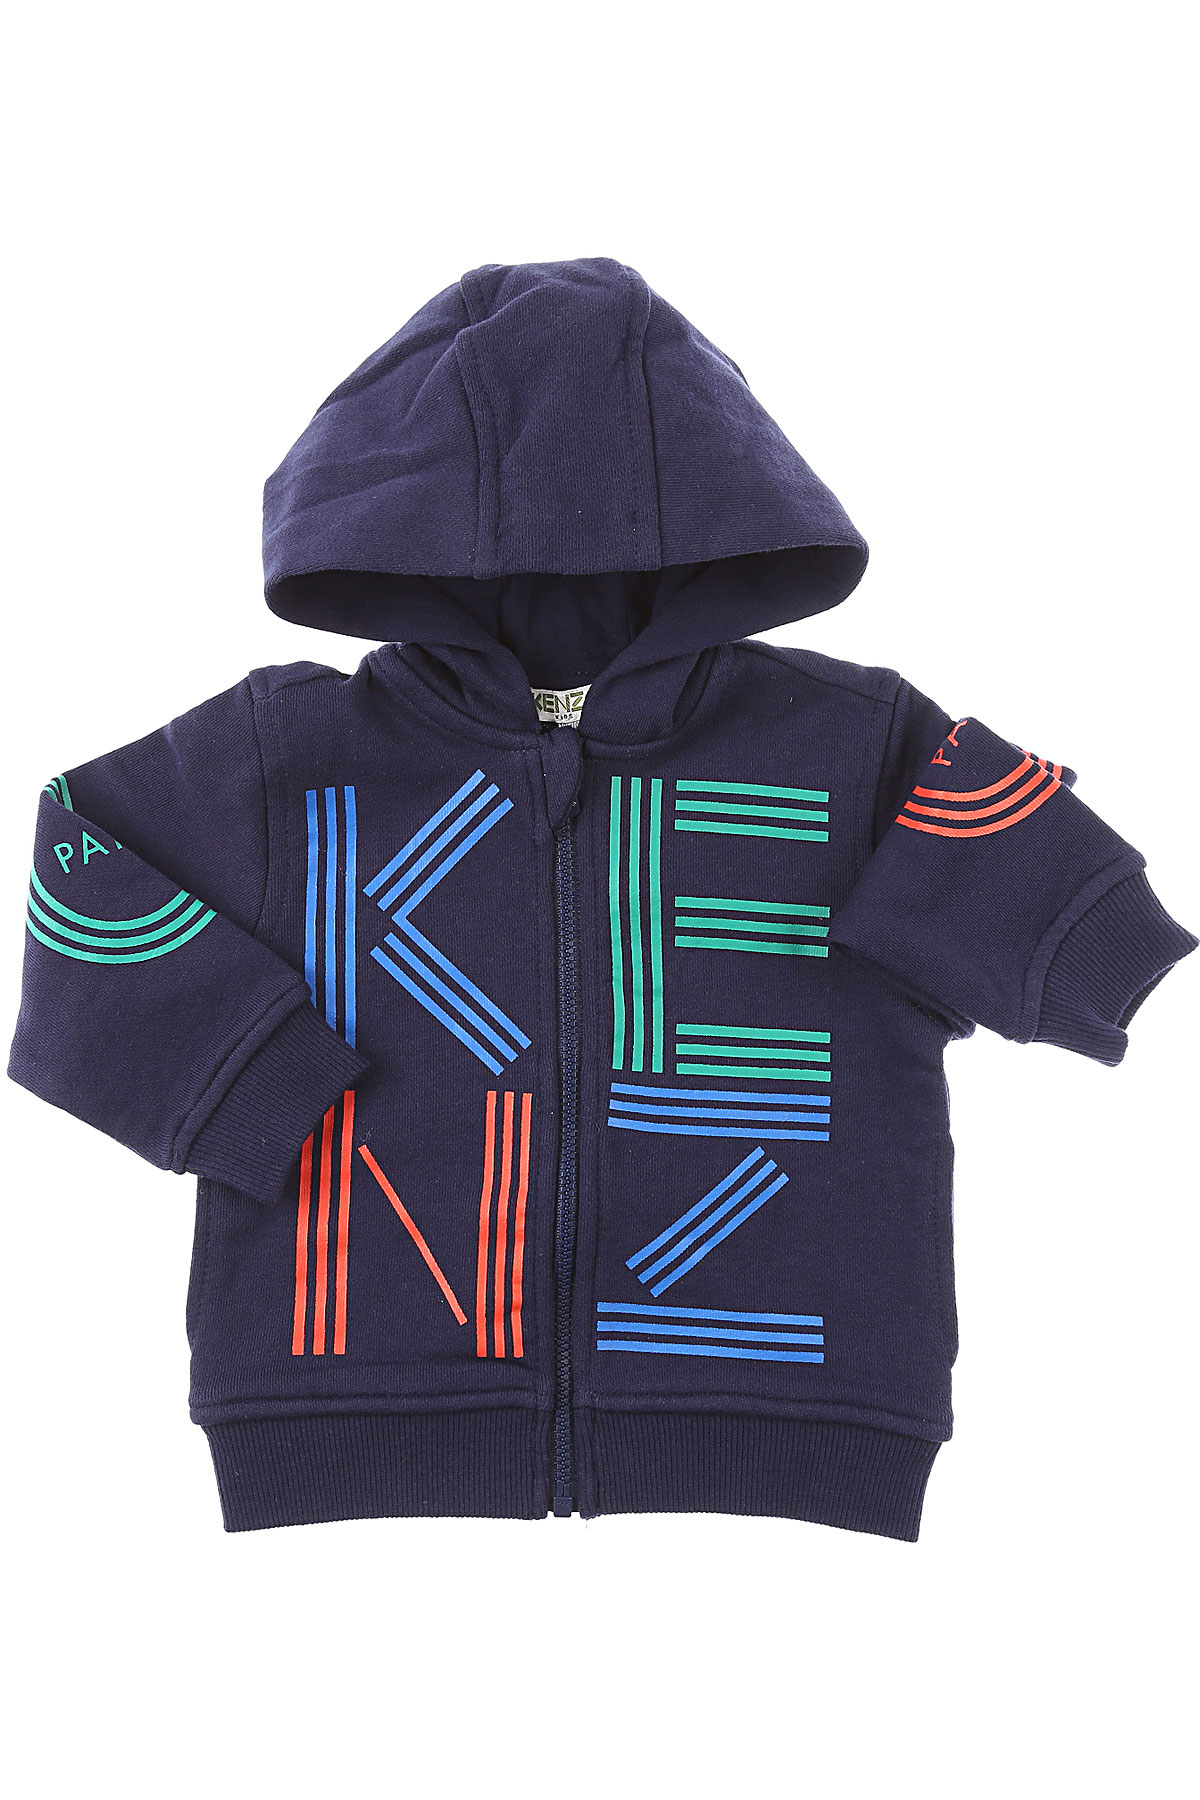 Kenzo Baby Sweatshirts & Hoodies for Boys On Sale, navy, Cotton, 2019, 12 M 18M 2Y 3Y 9M